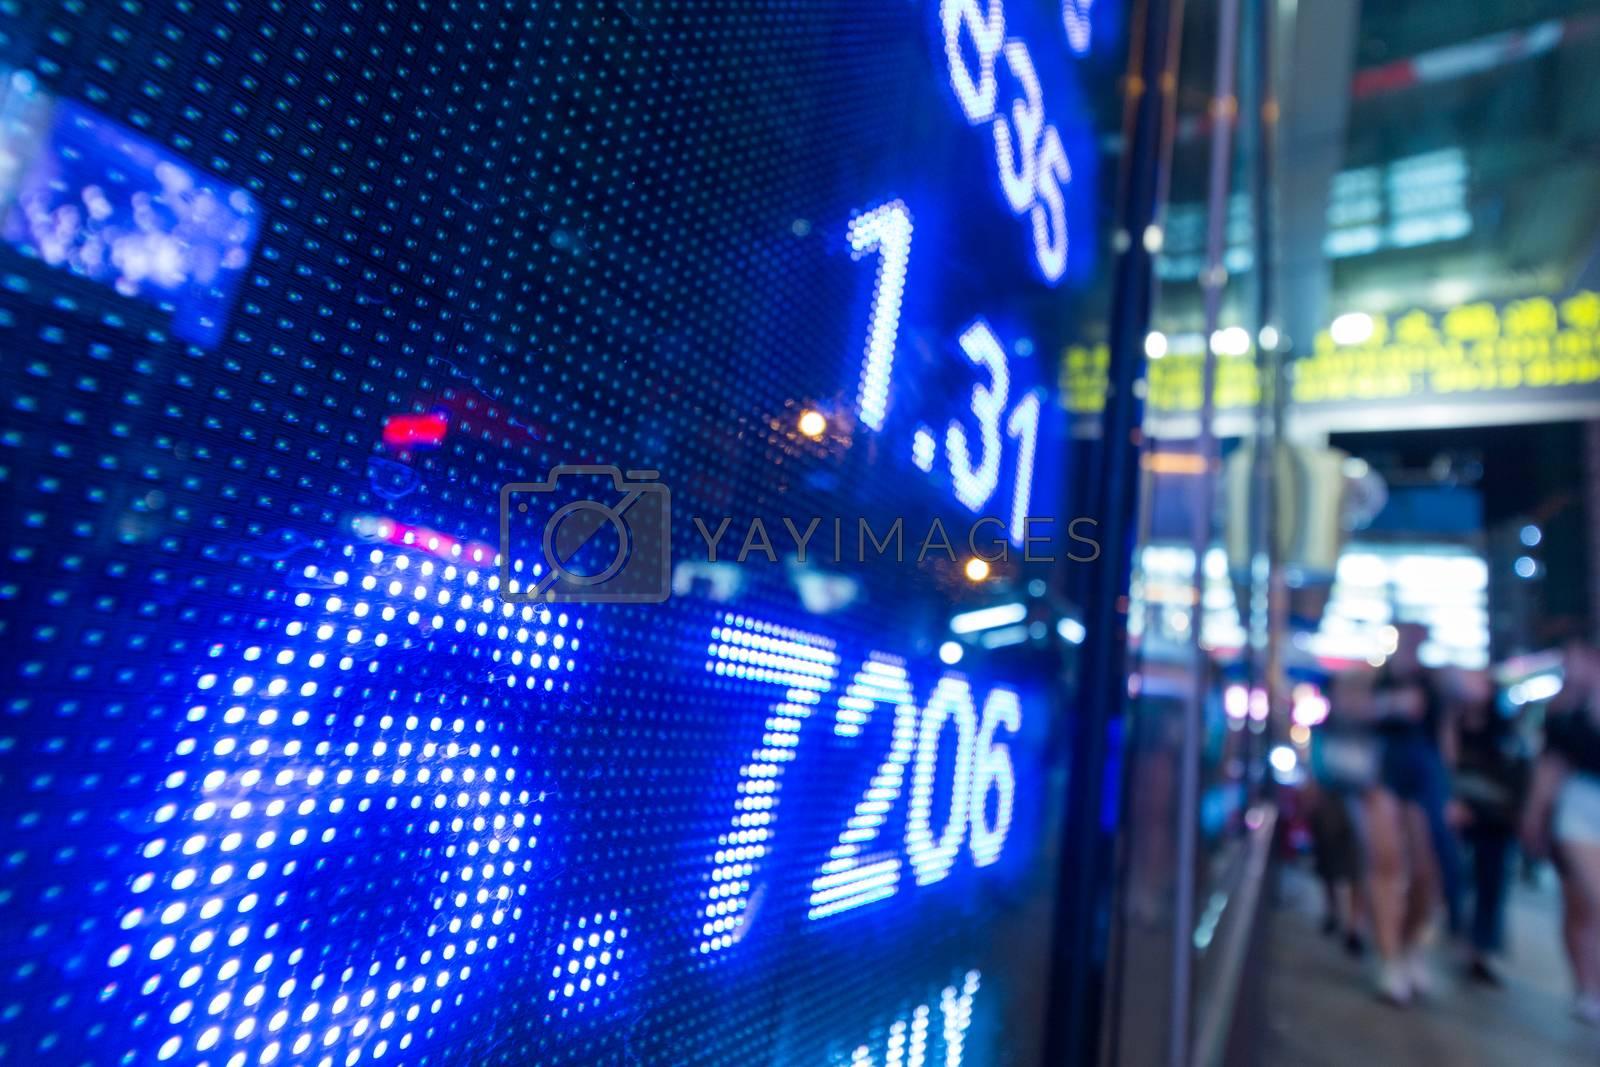 Royalty free image of Stock market price display by leungchopan